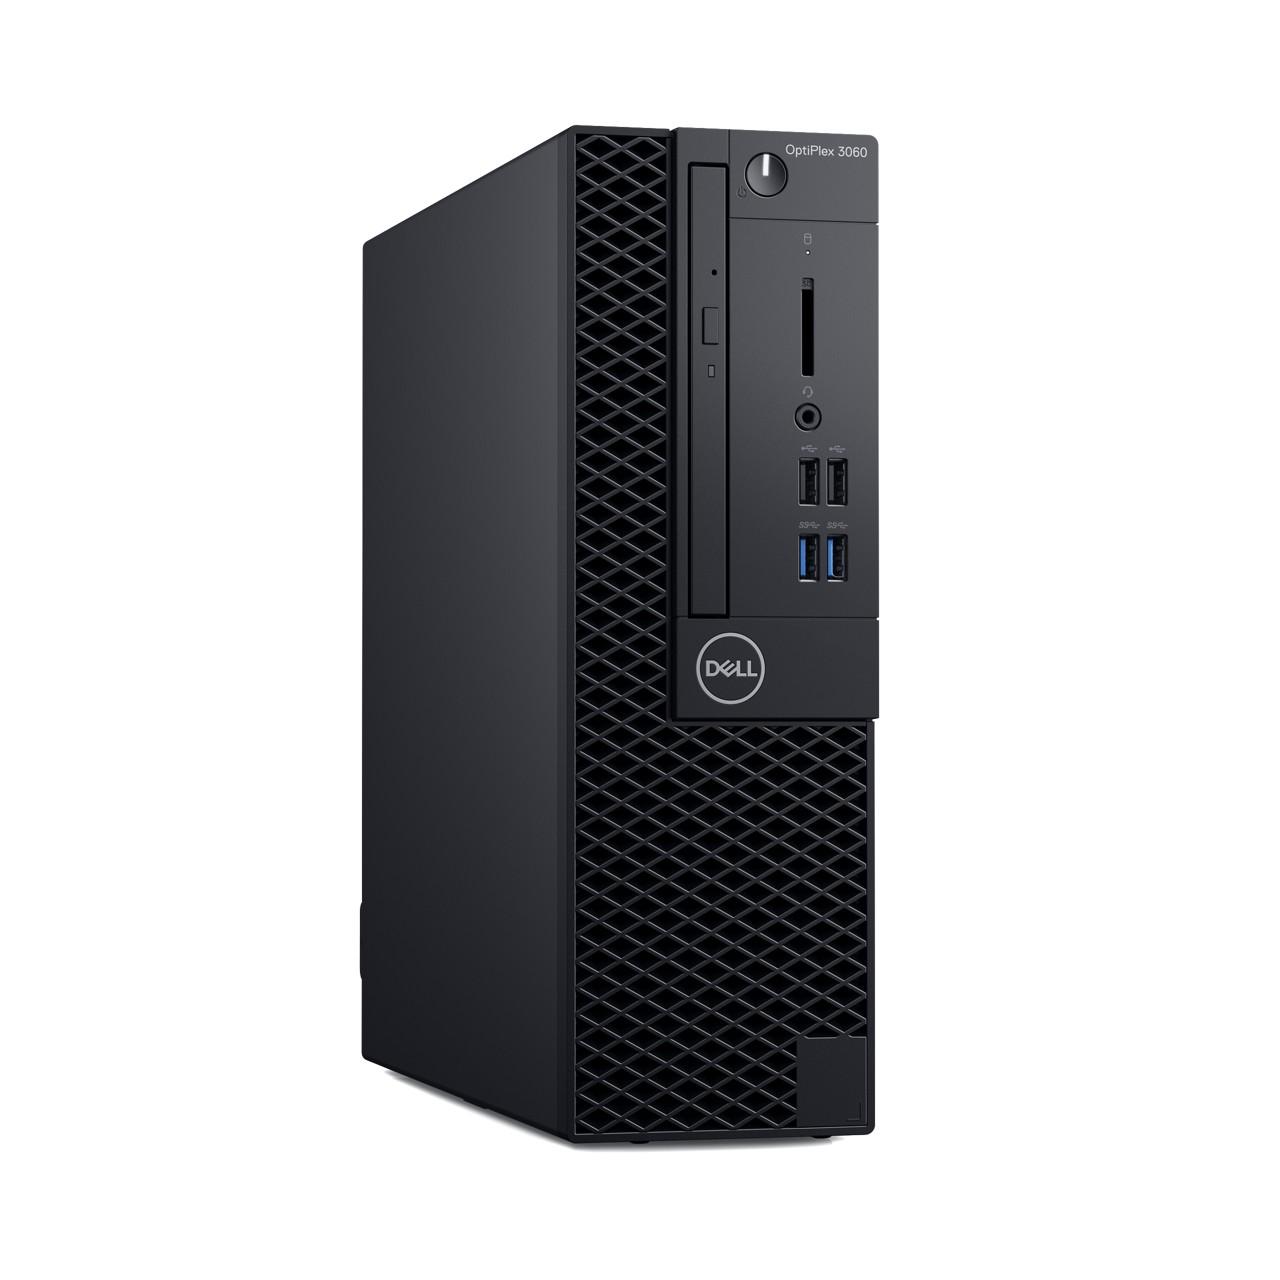 Dell OptiPlex 3060 Small Form Factor Desktop- Intel i5-8500 - 500GB HDD-  8GB Ram- Win 10 Pro